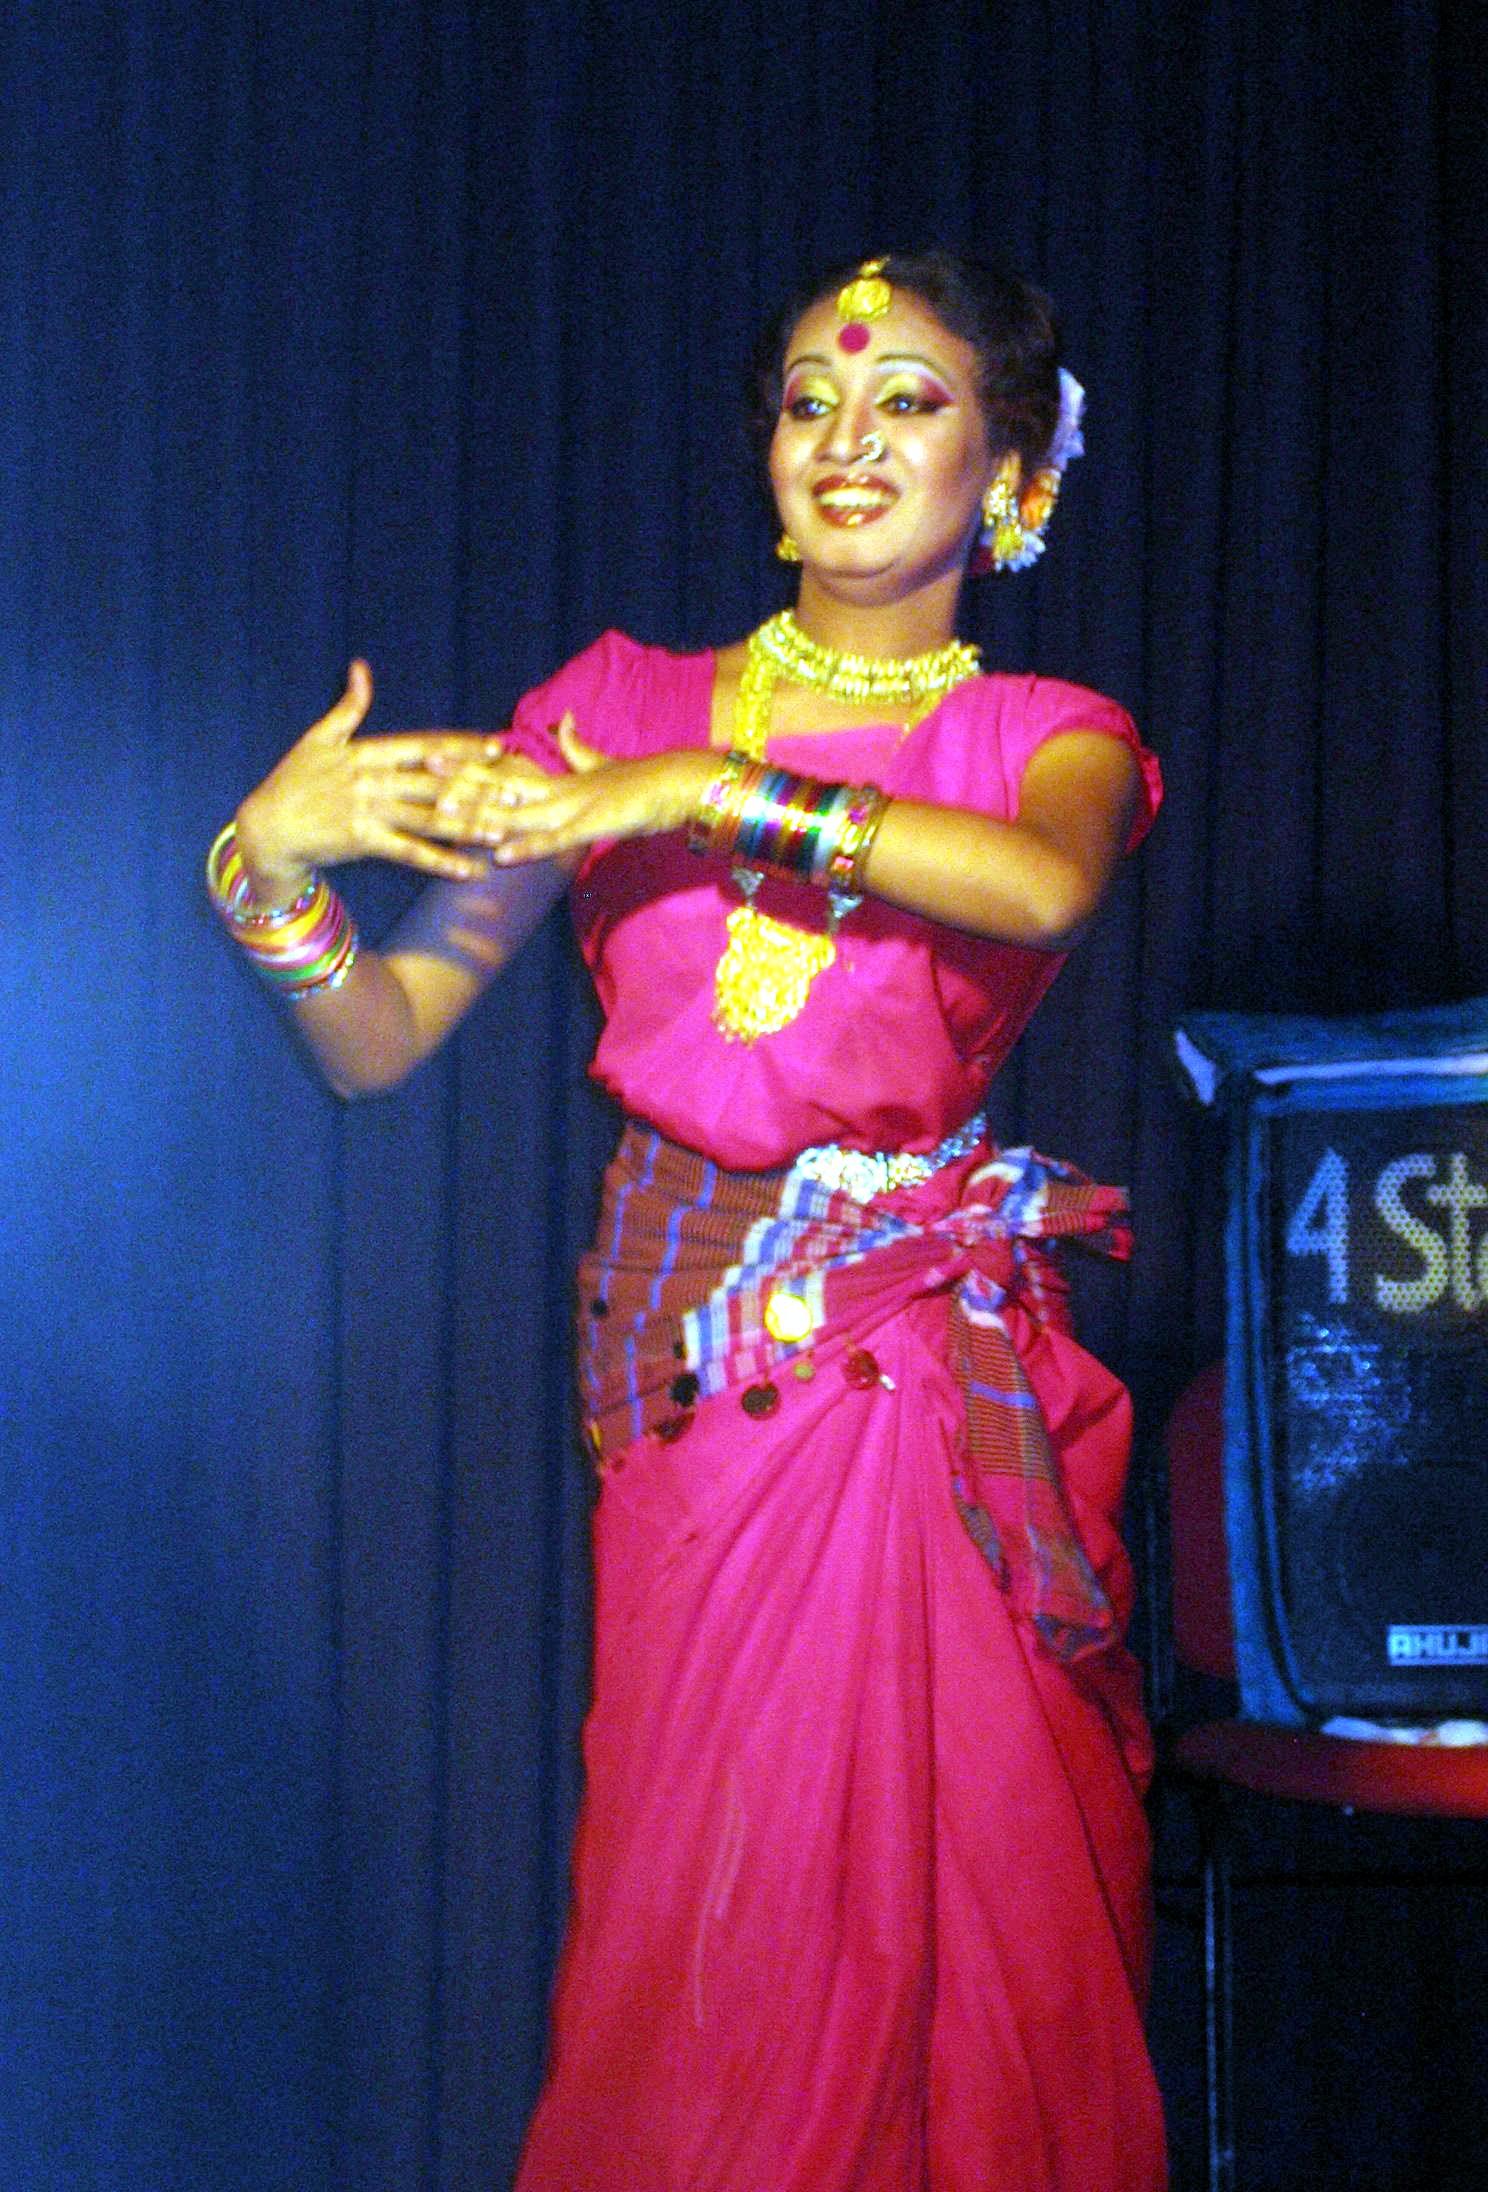 A women dances in traditional dress